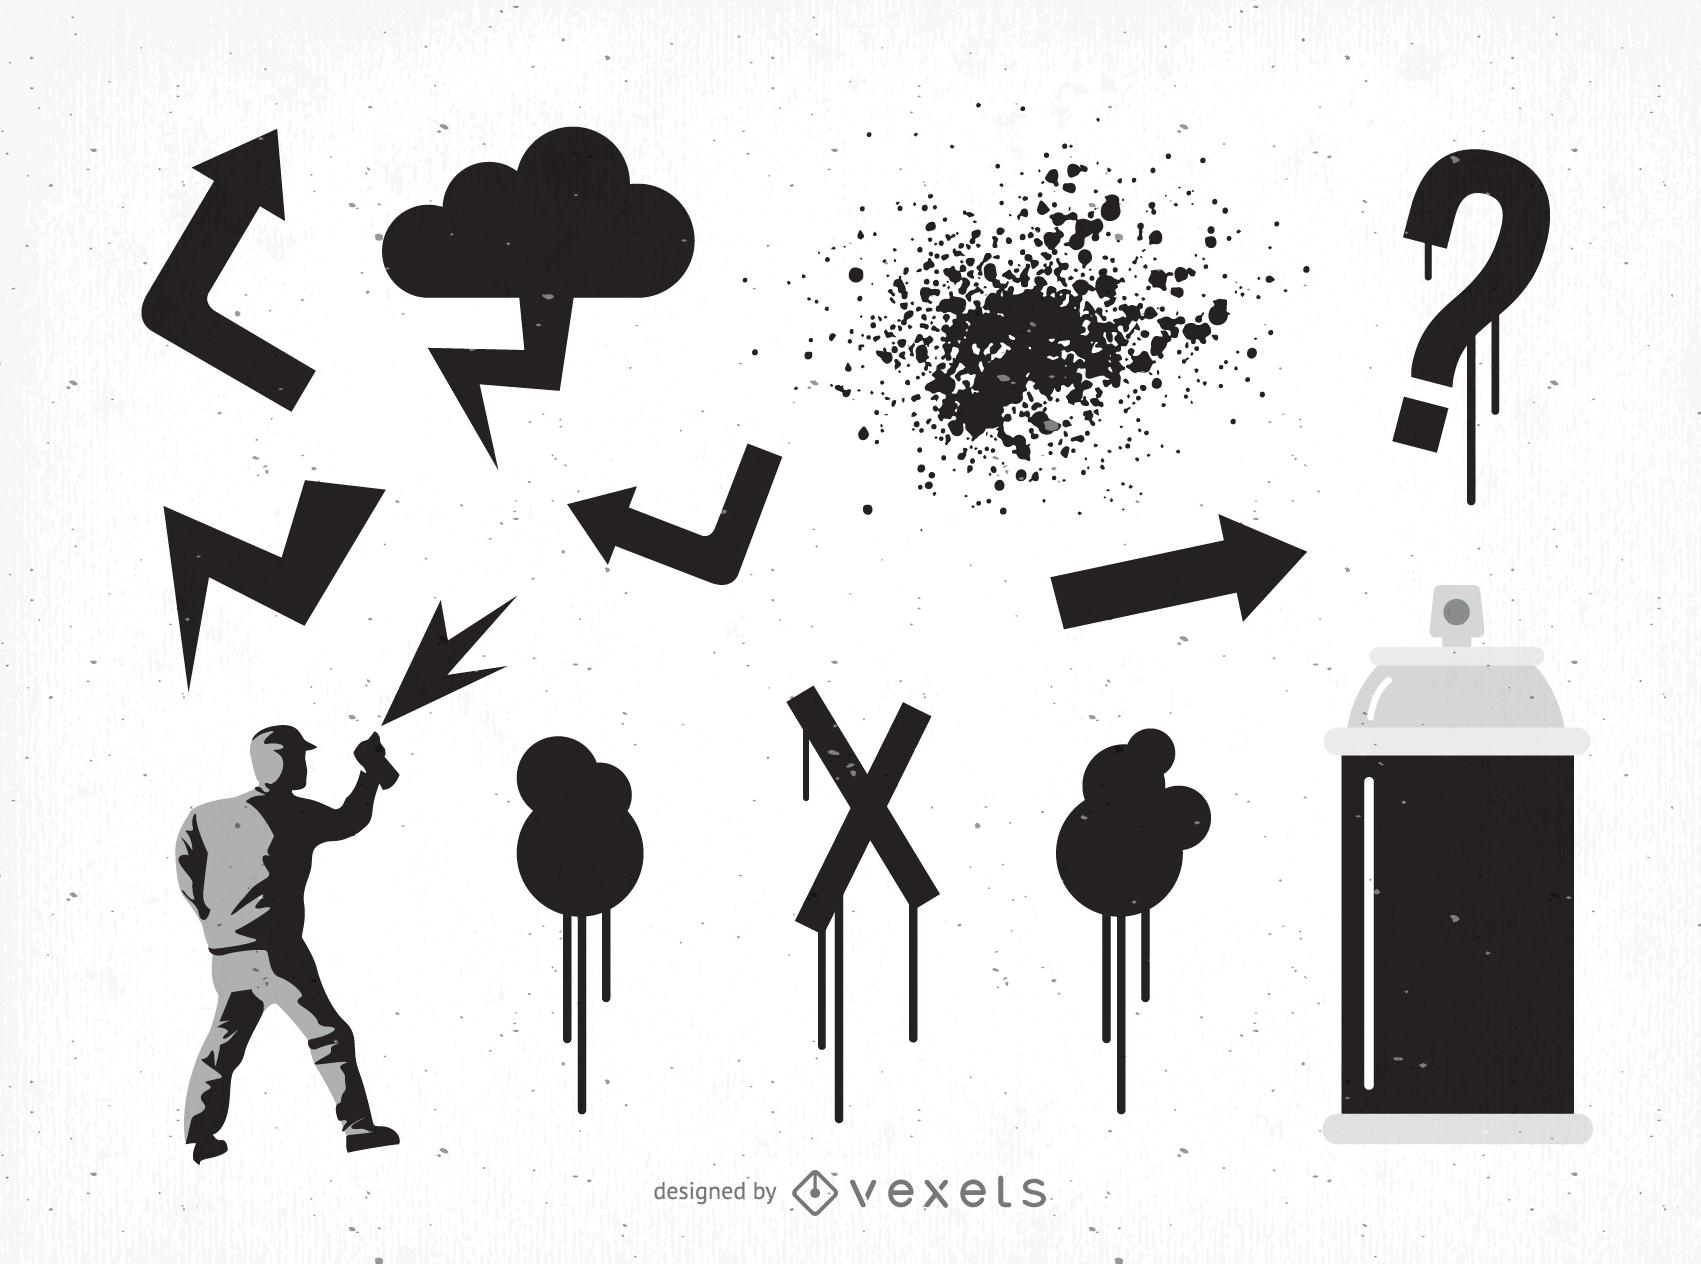 Arte vetorial de Graffiti Dj